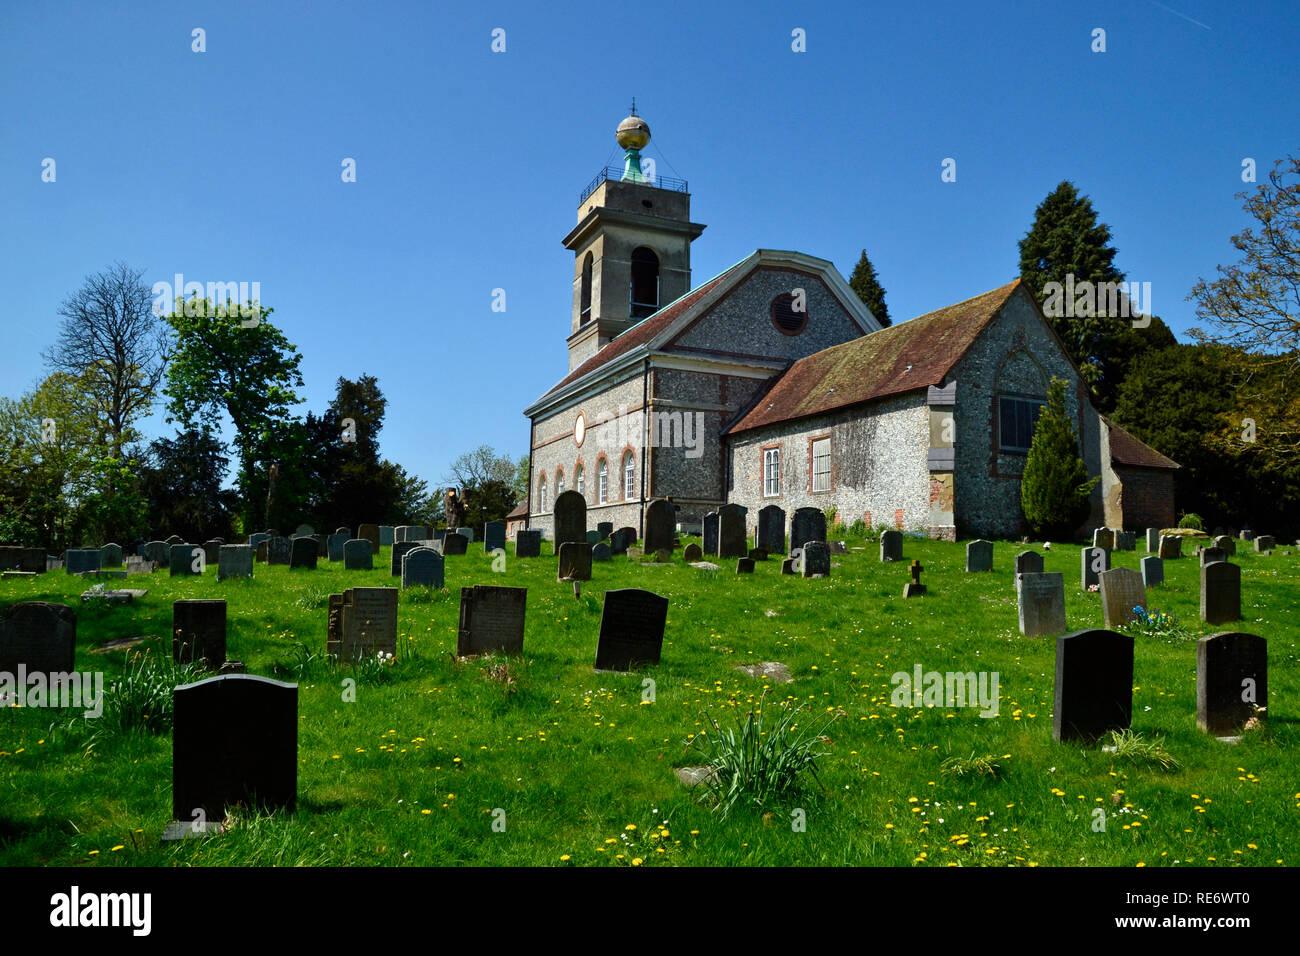 St Lawrence's Church, West Wycombe, Buckinghamshire, UK. Chilterns. Landscape. - Stock Image